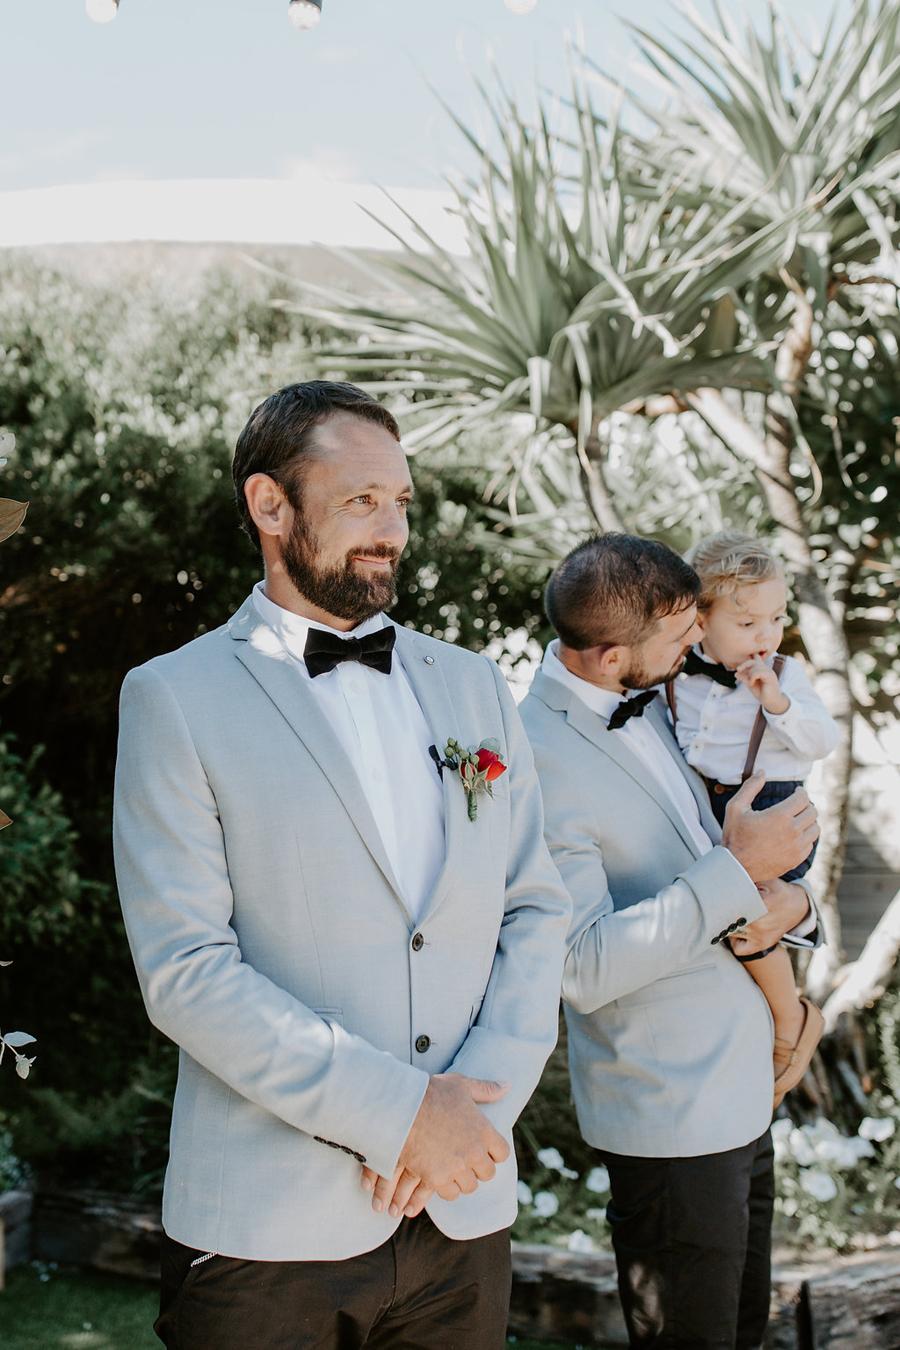 osteria-casuarina-wedding-venue-tweed-coast-weddings-coastal-garden-reception-real-wedding015.jpg